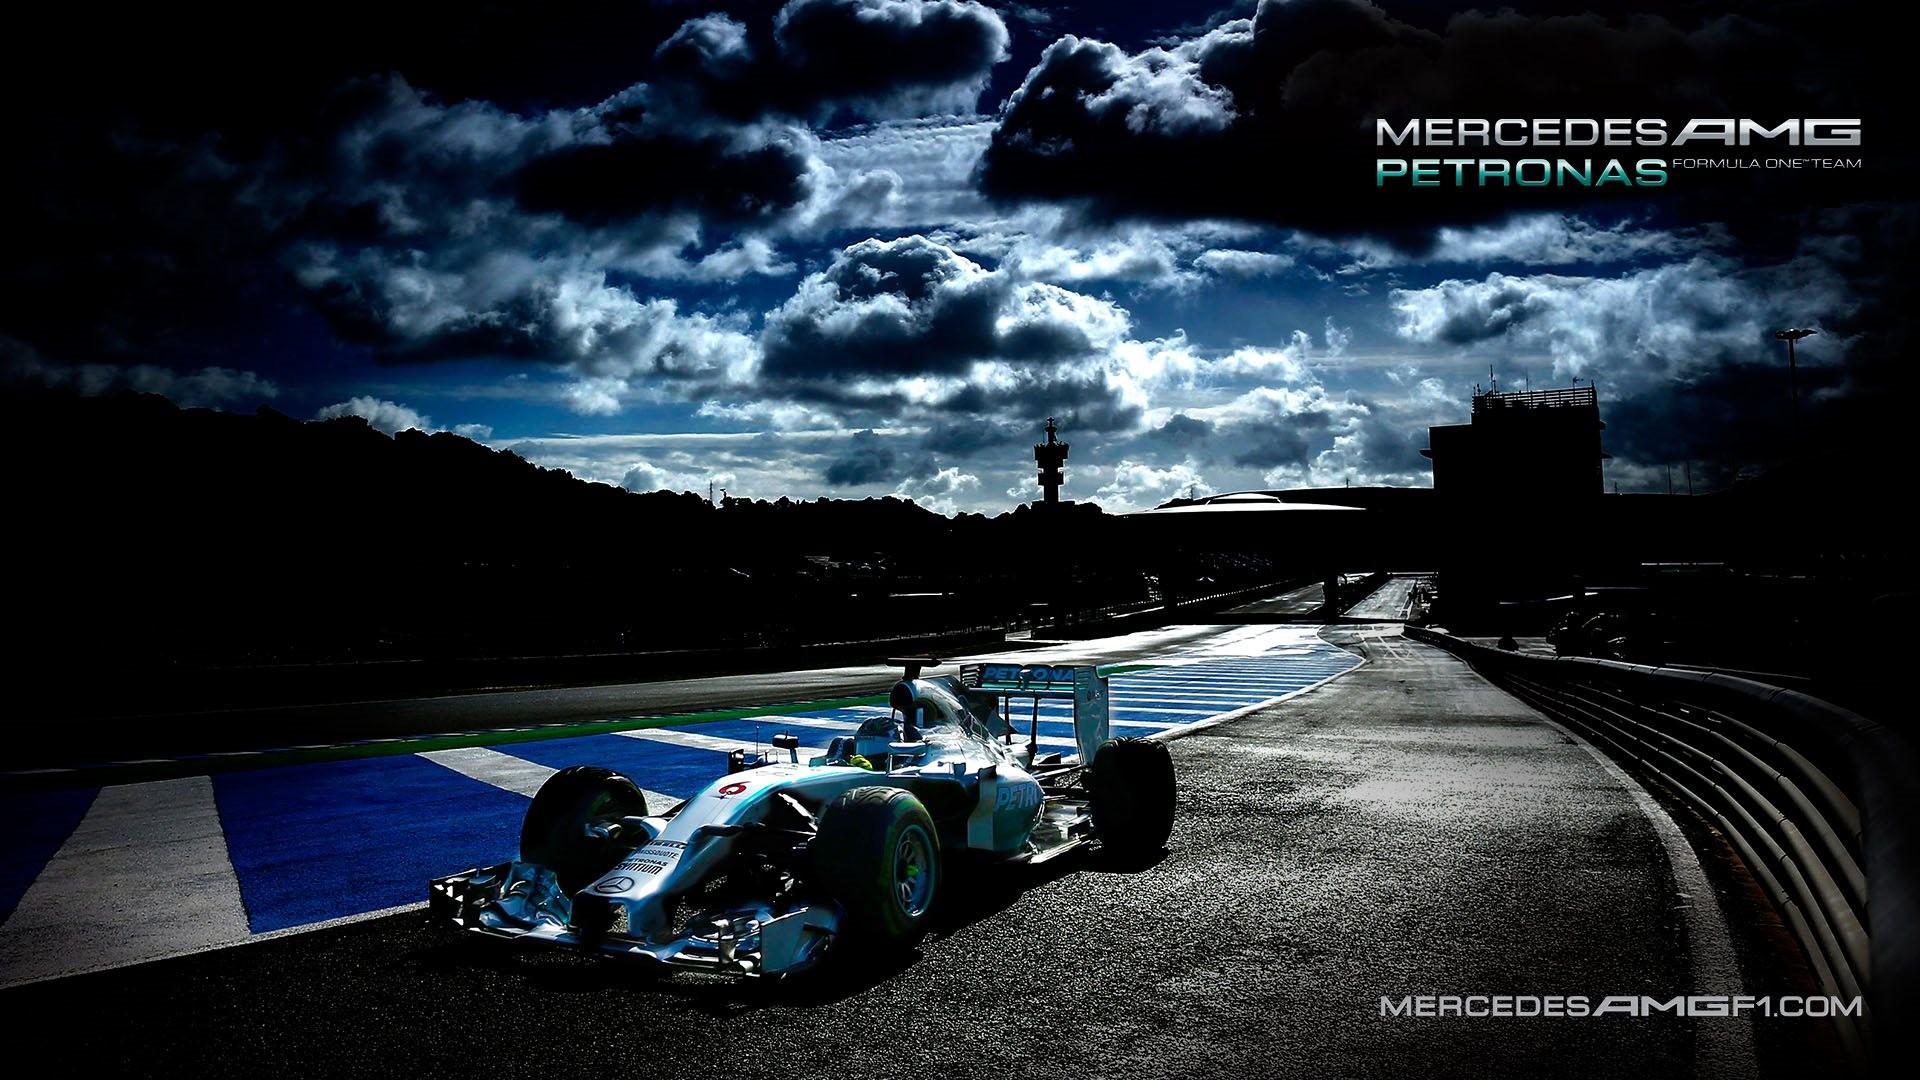 Mercedes Amg Petronas F1 Hd Hintergrundbilder 4k: 1440x900 HD Wallpaper ·① WallpaperTag